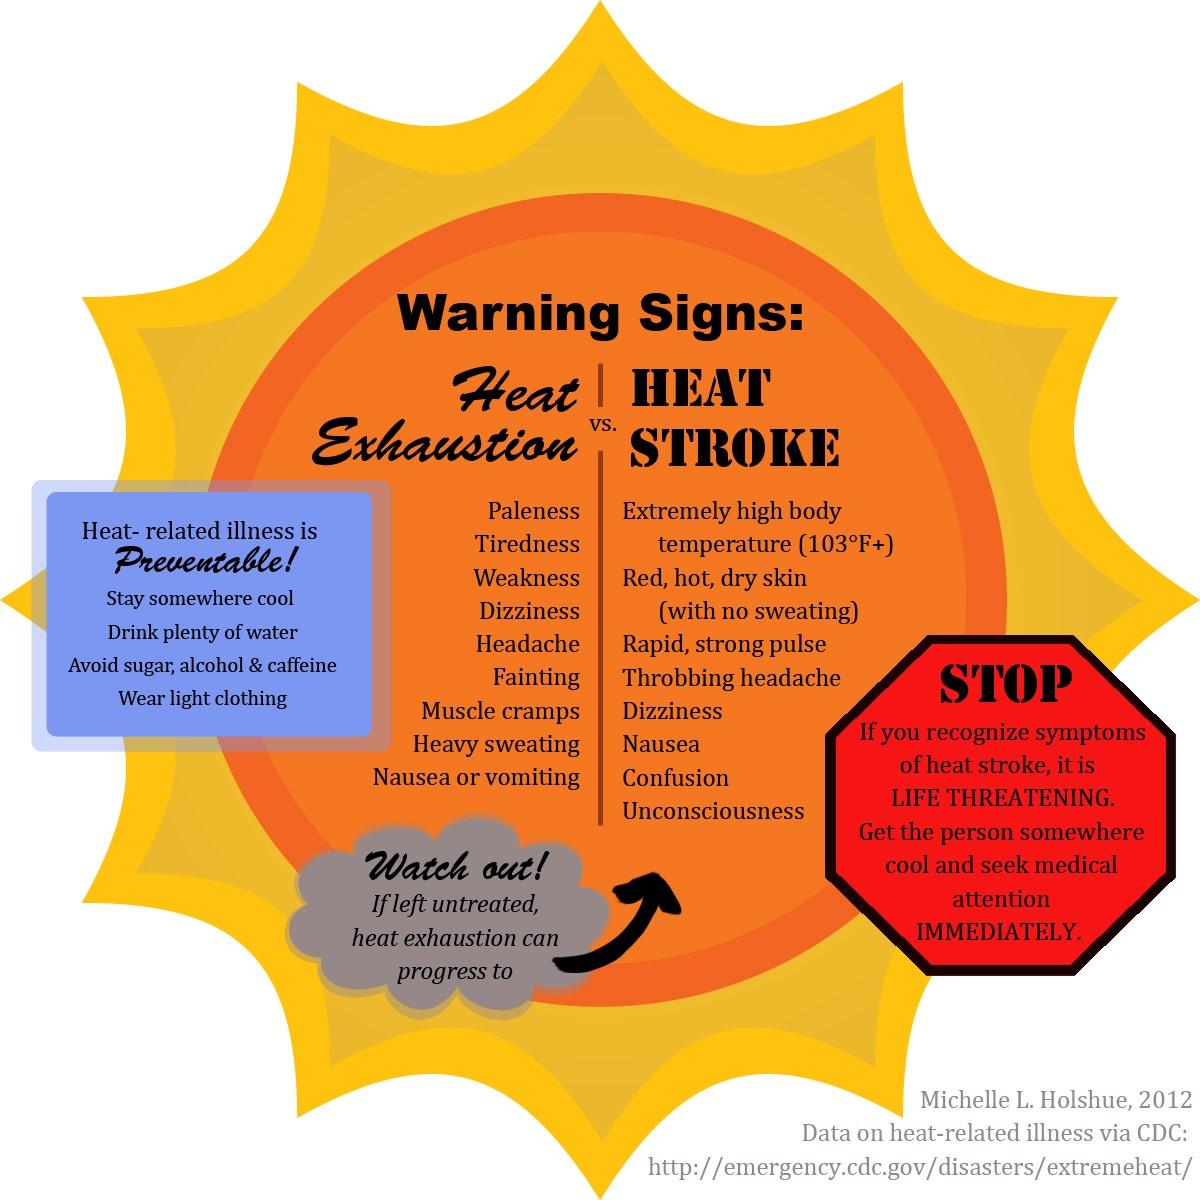 Signs of heat illness